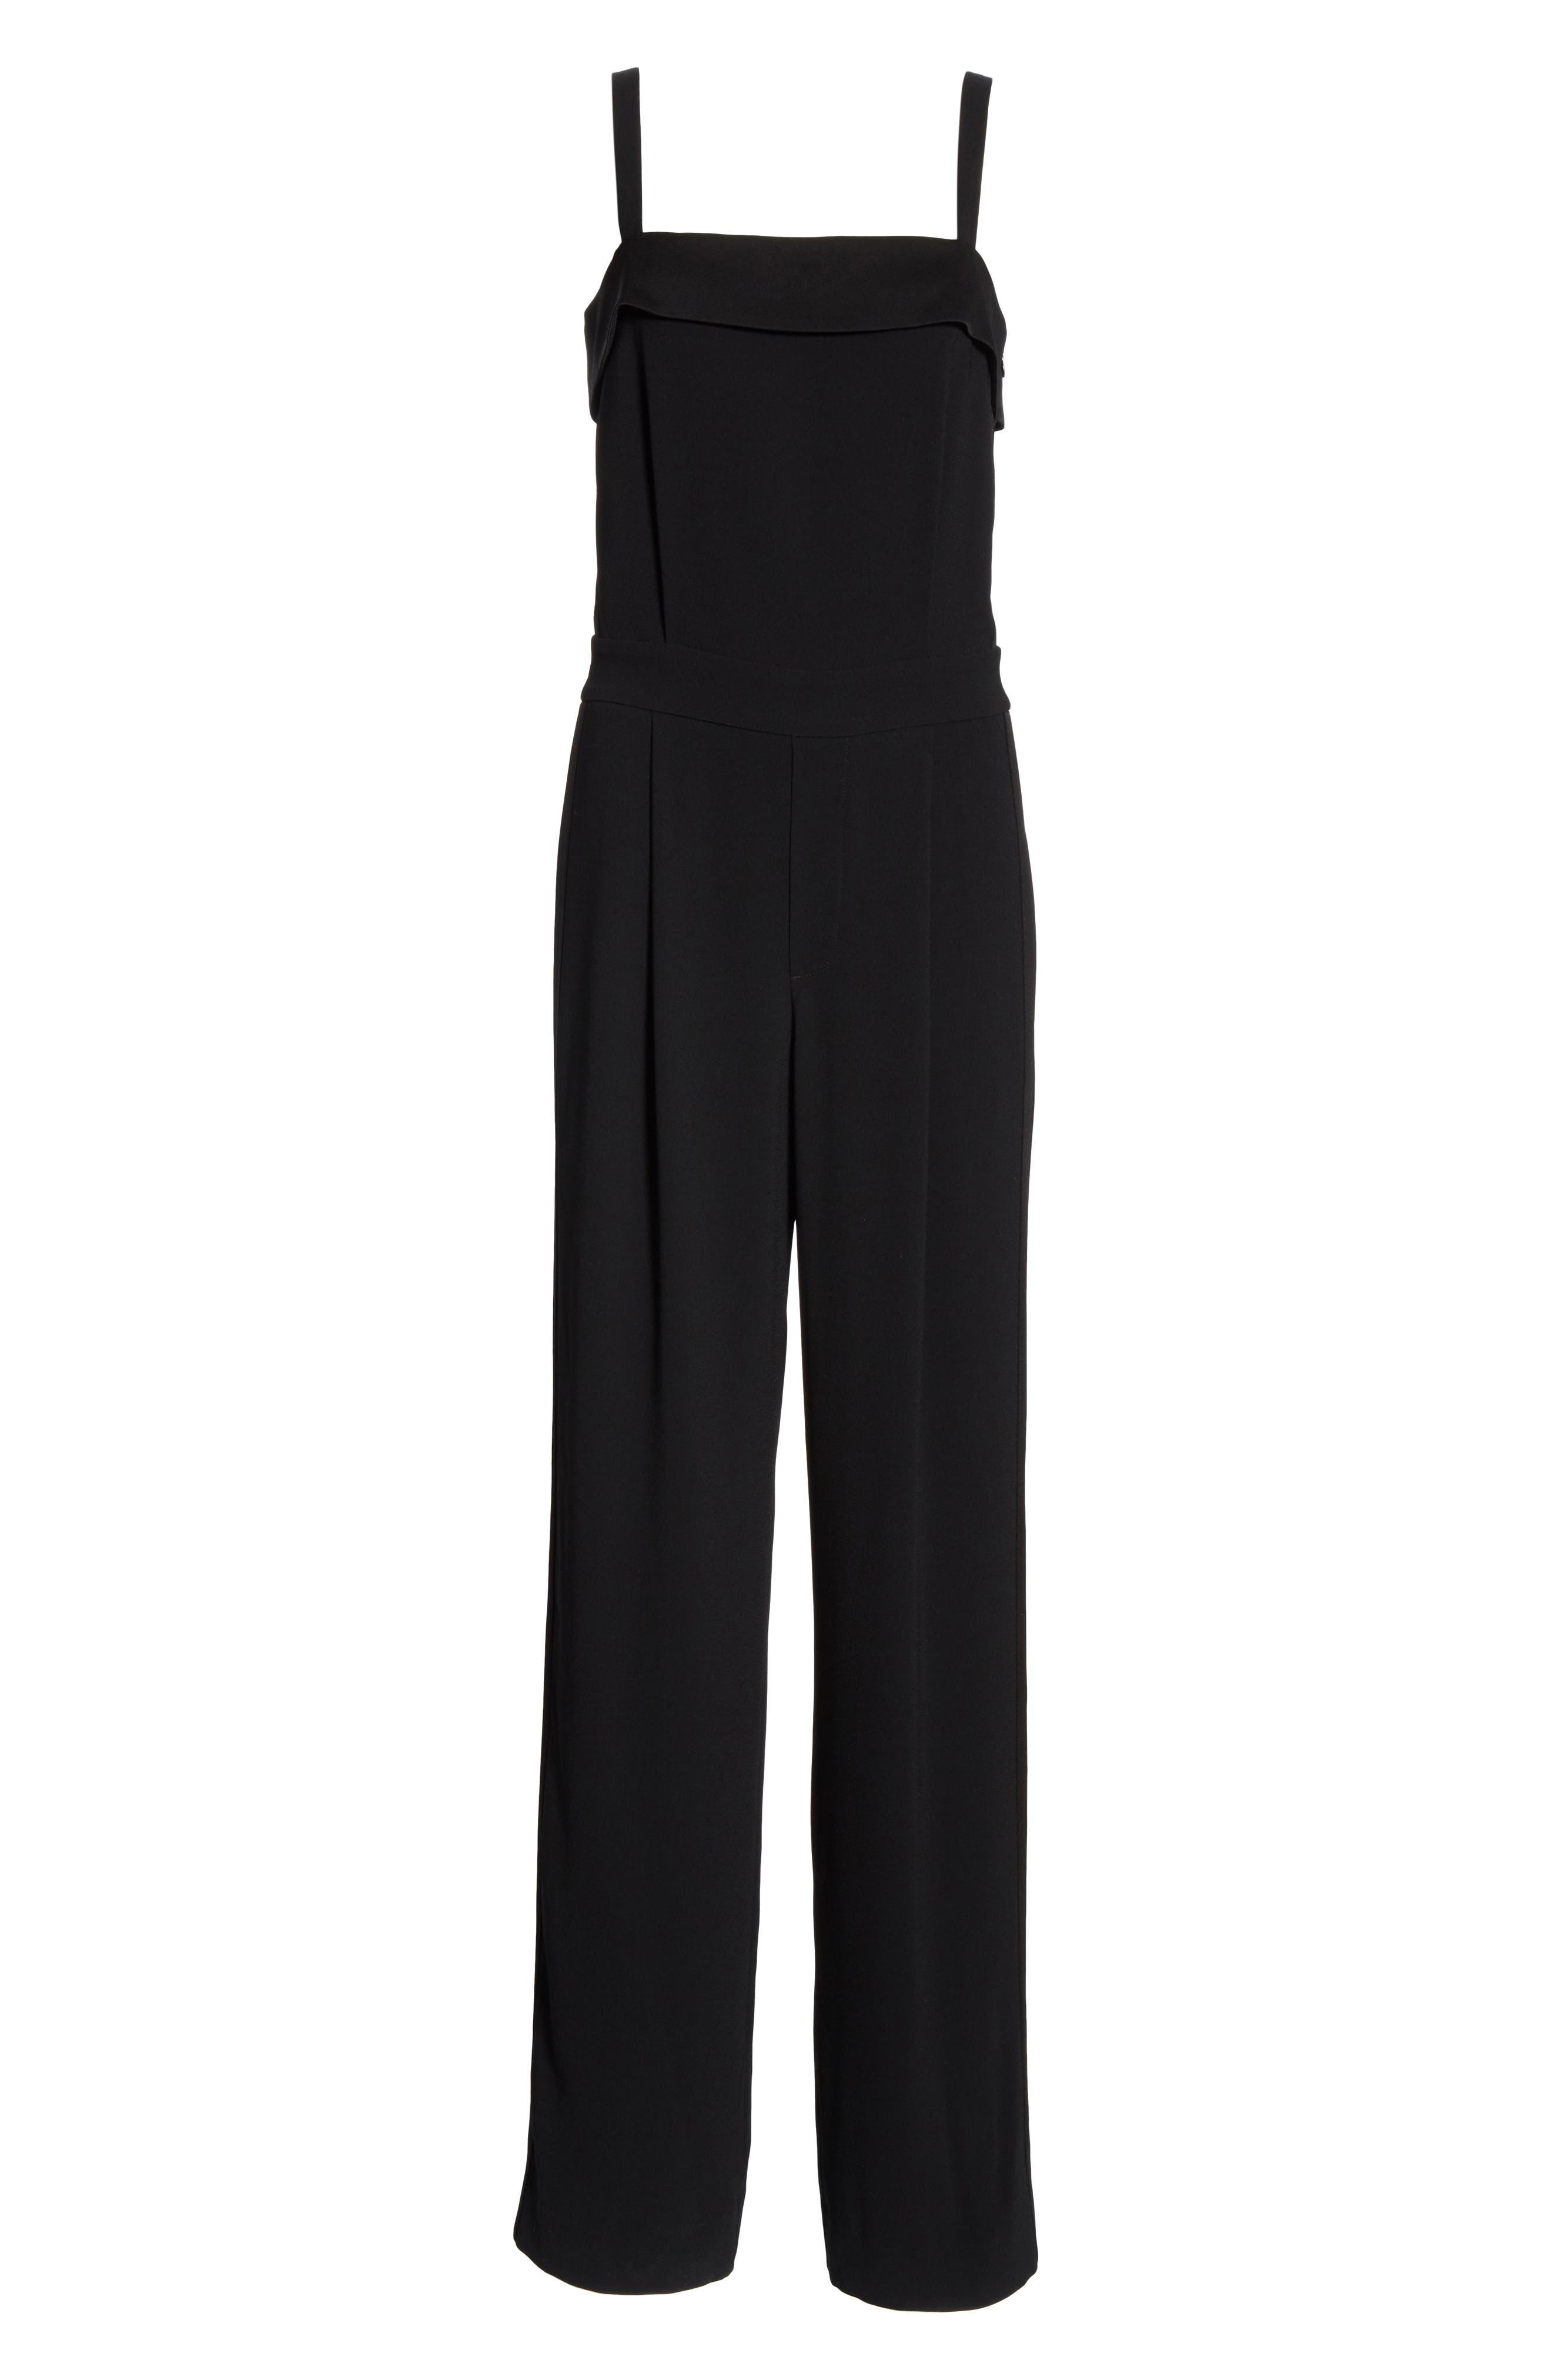 VINCE, Sleeveless Tuxedo Jumpsuit, Alternate thumbnail 7, color, BLACK